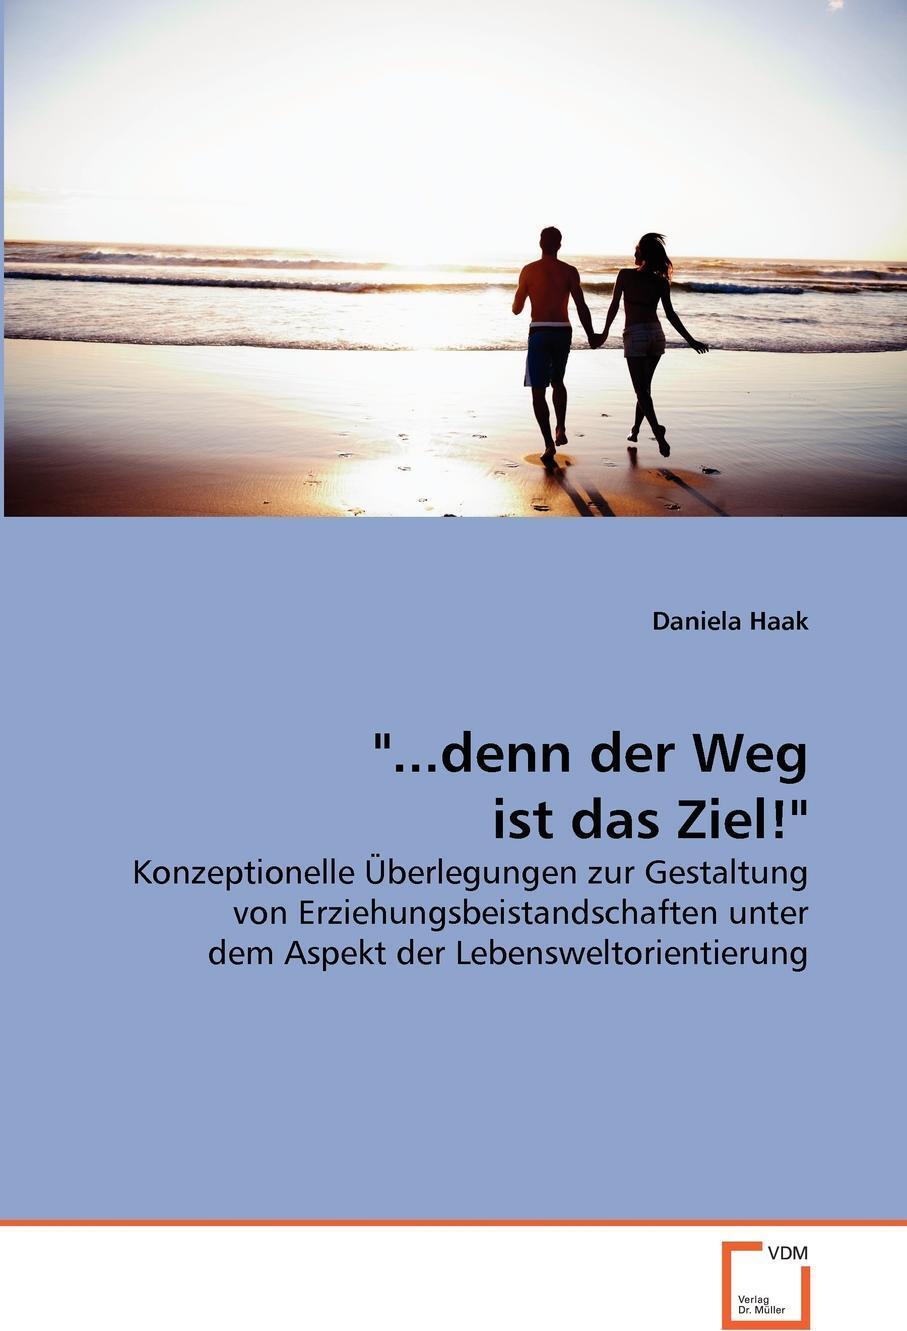 "Daniela Haak. ""...denn der Weg ist das Ziel!"""